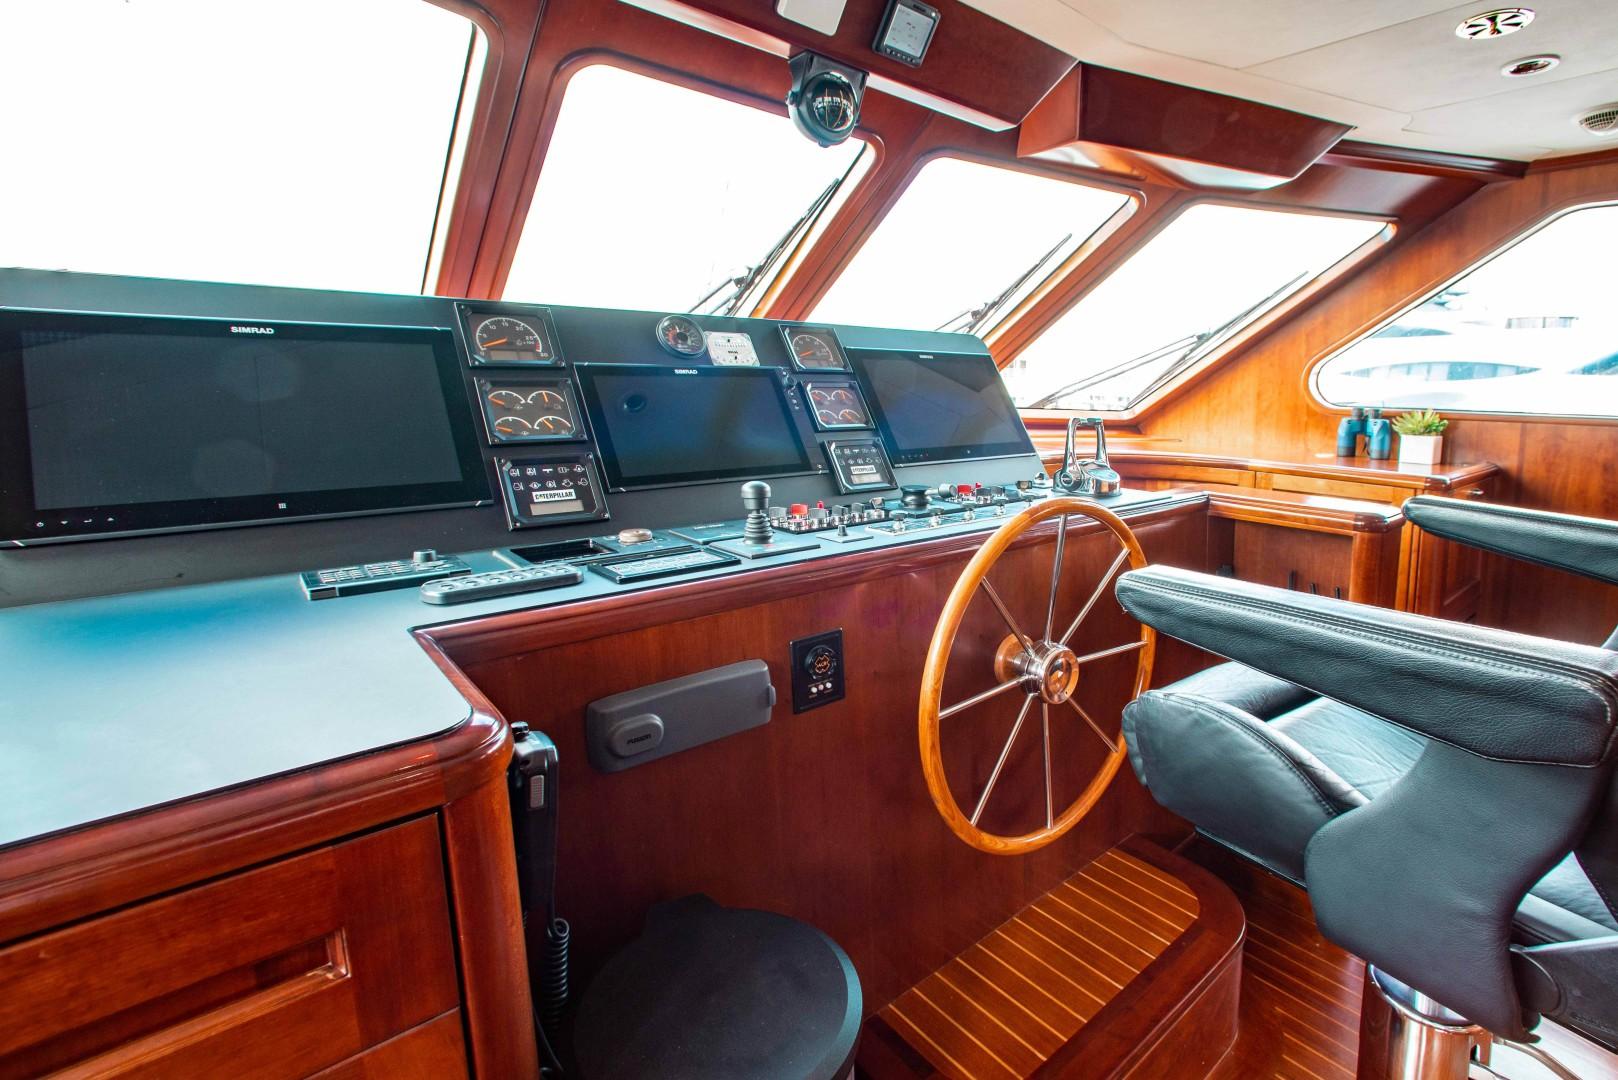 Conrad Shipyard-88 Motor Yacht 2005-Chillin Fort Lauderdale-Florida-United States-2000 Conrad Shipyard 88 Motor Yacht Chillin-1642471   Thumbnail